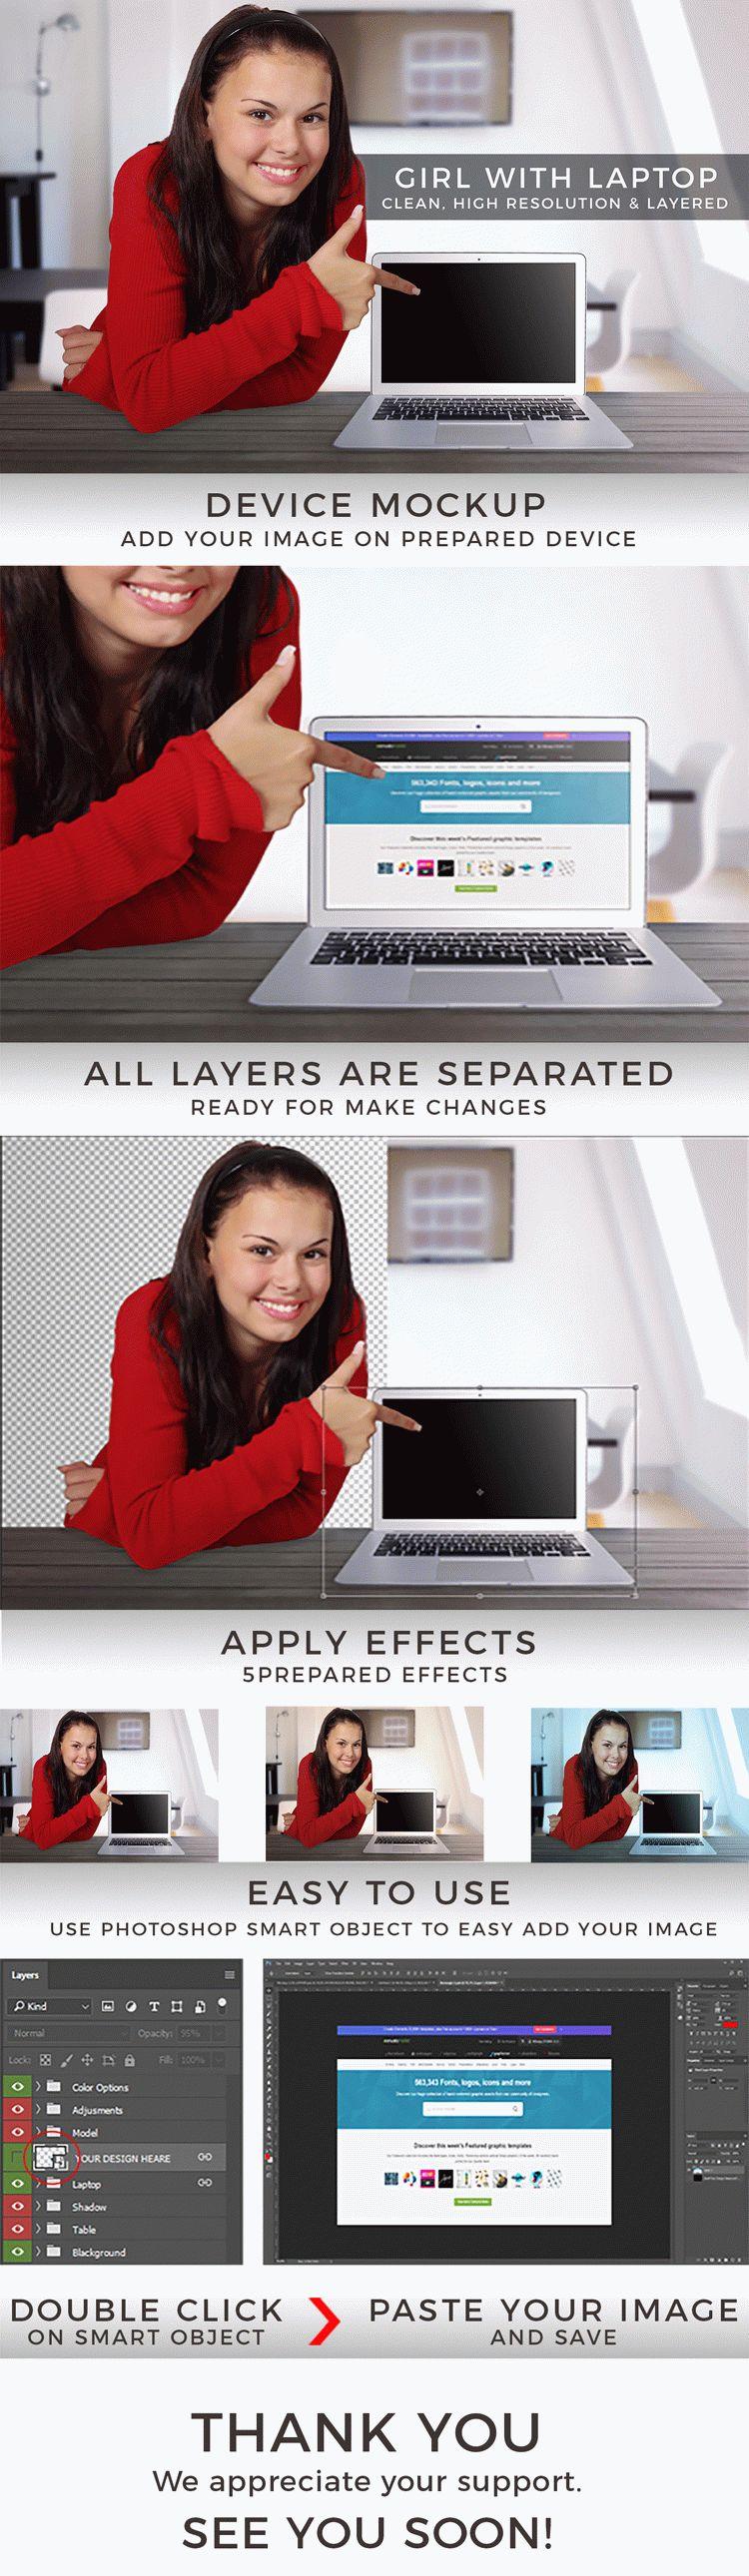 Girl With Laptop Mockup FREE MOCKUP